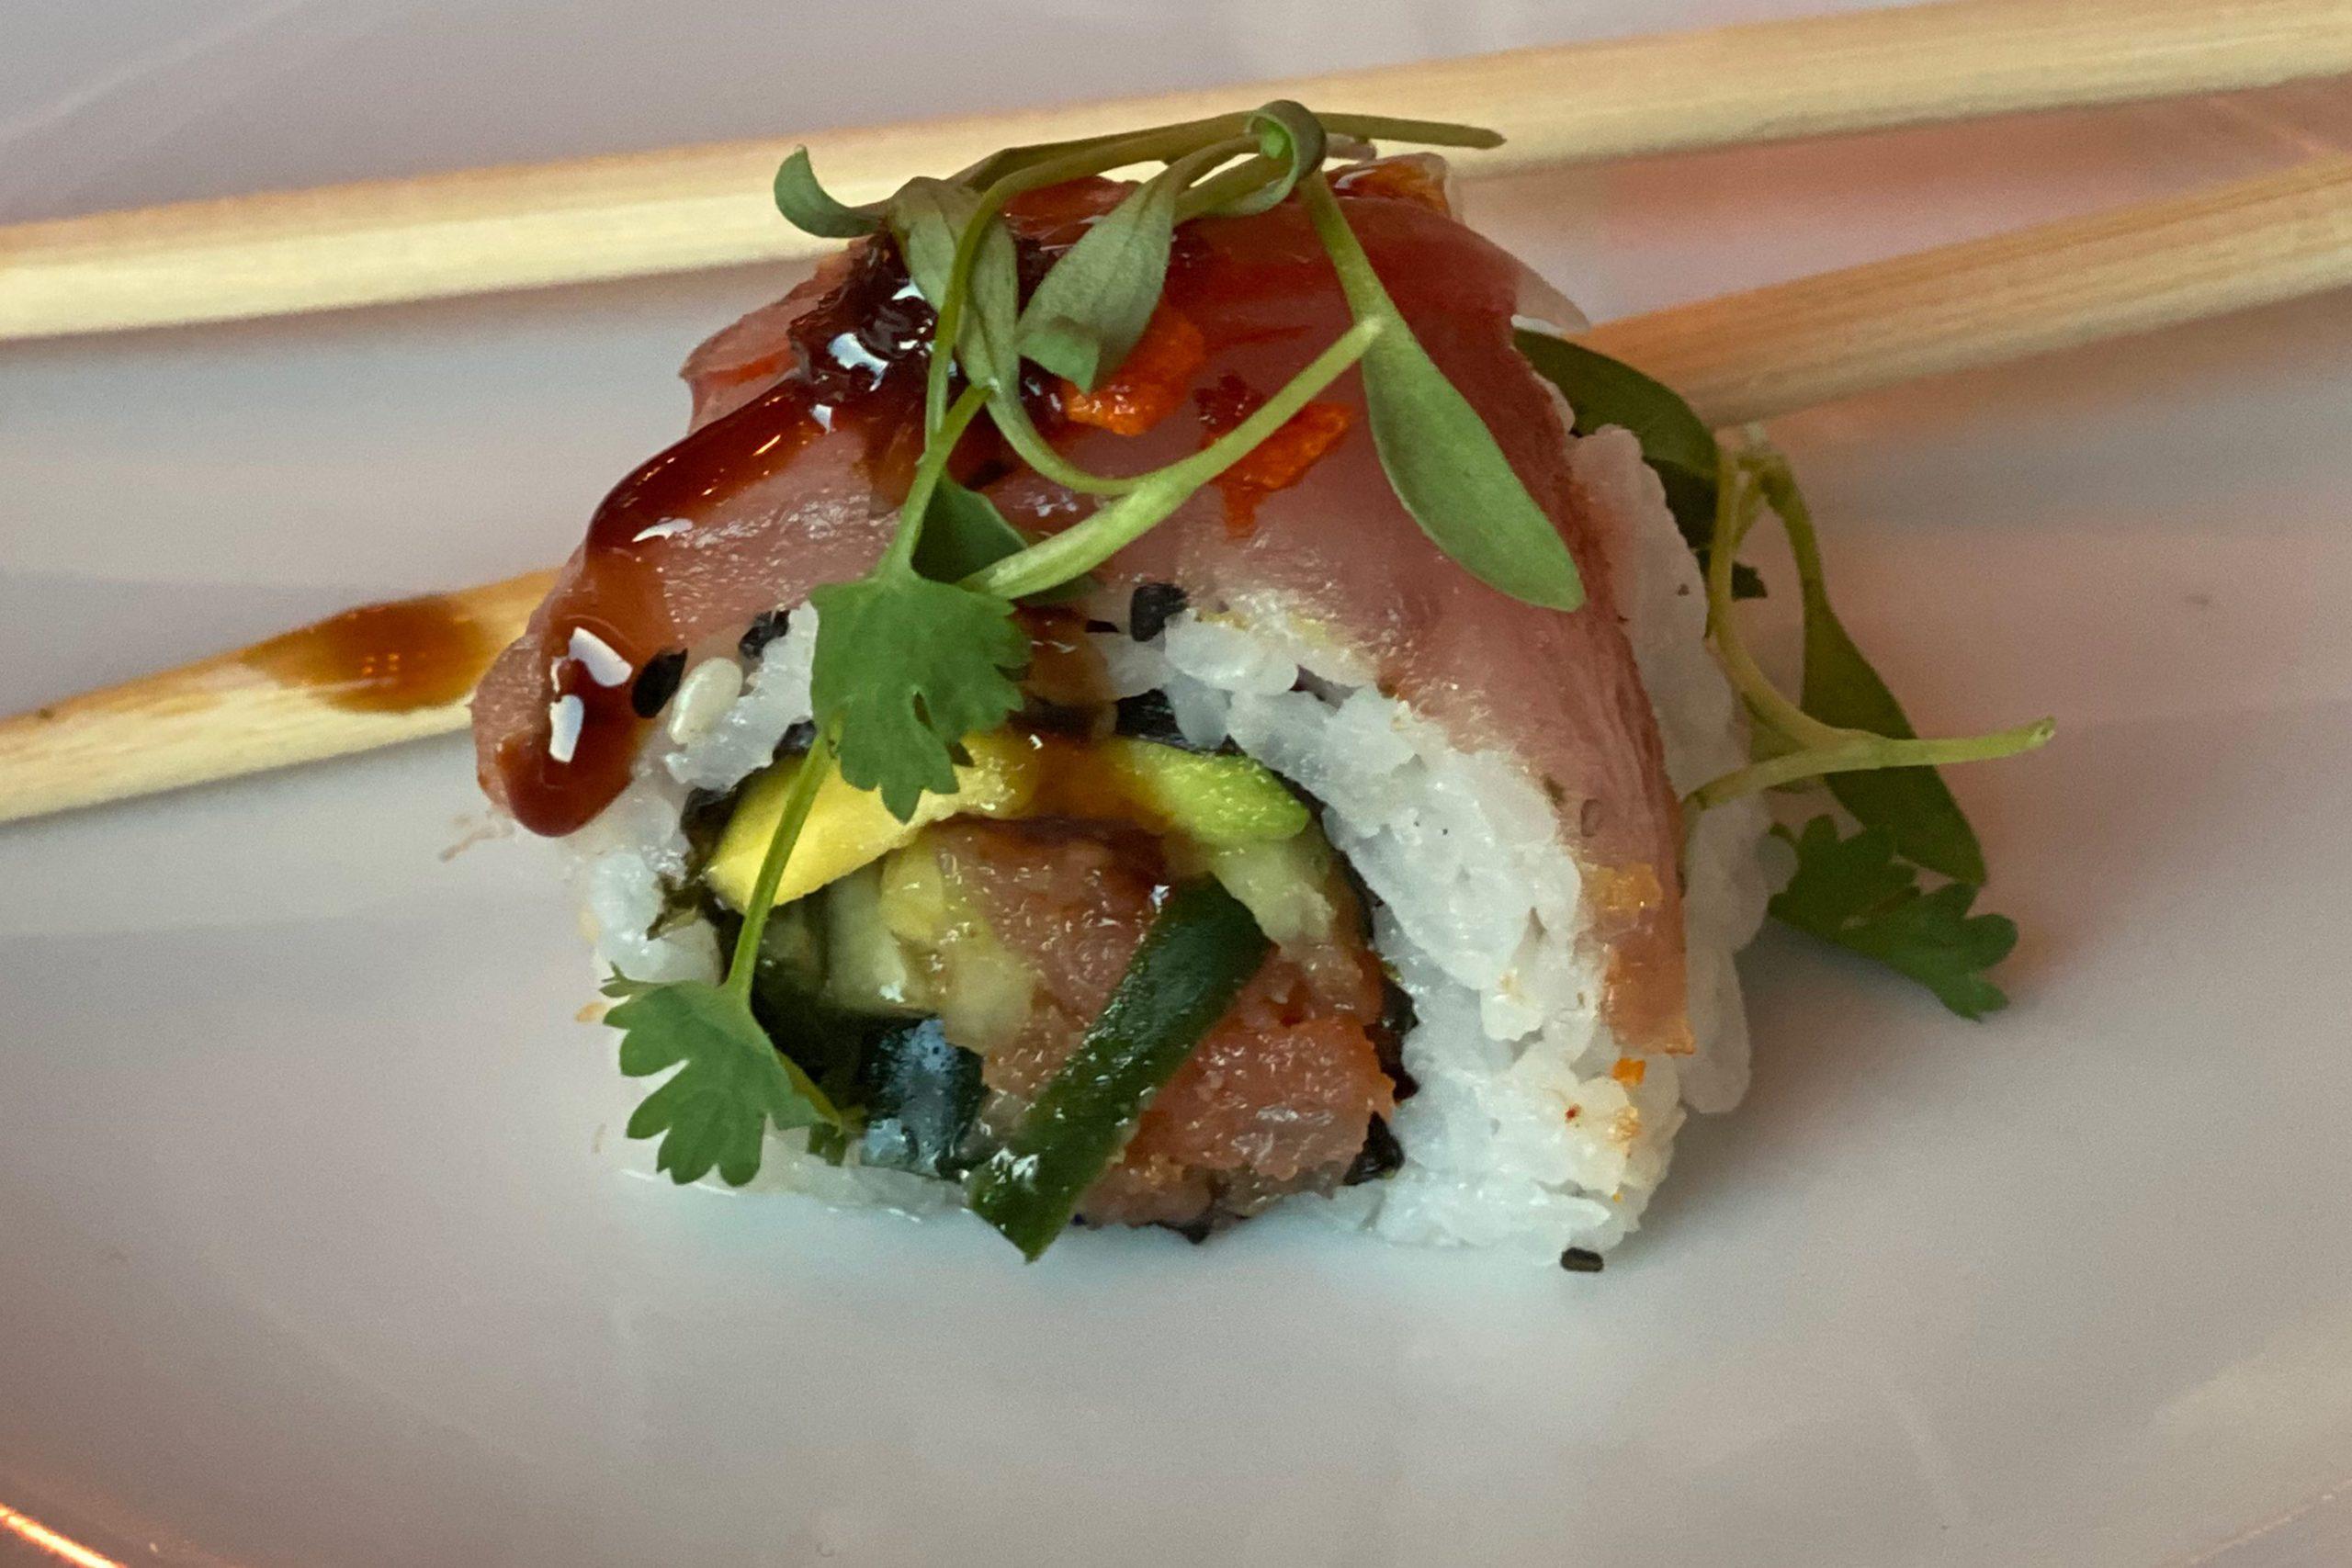 Taps Signature Sushi. Photo by Matthew Johnson, PHOENIX